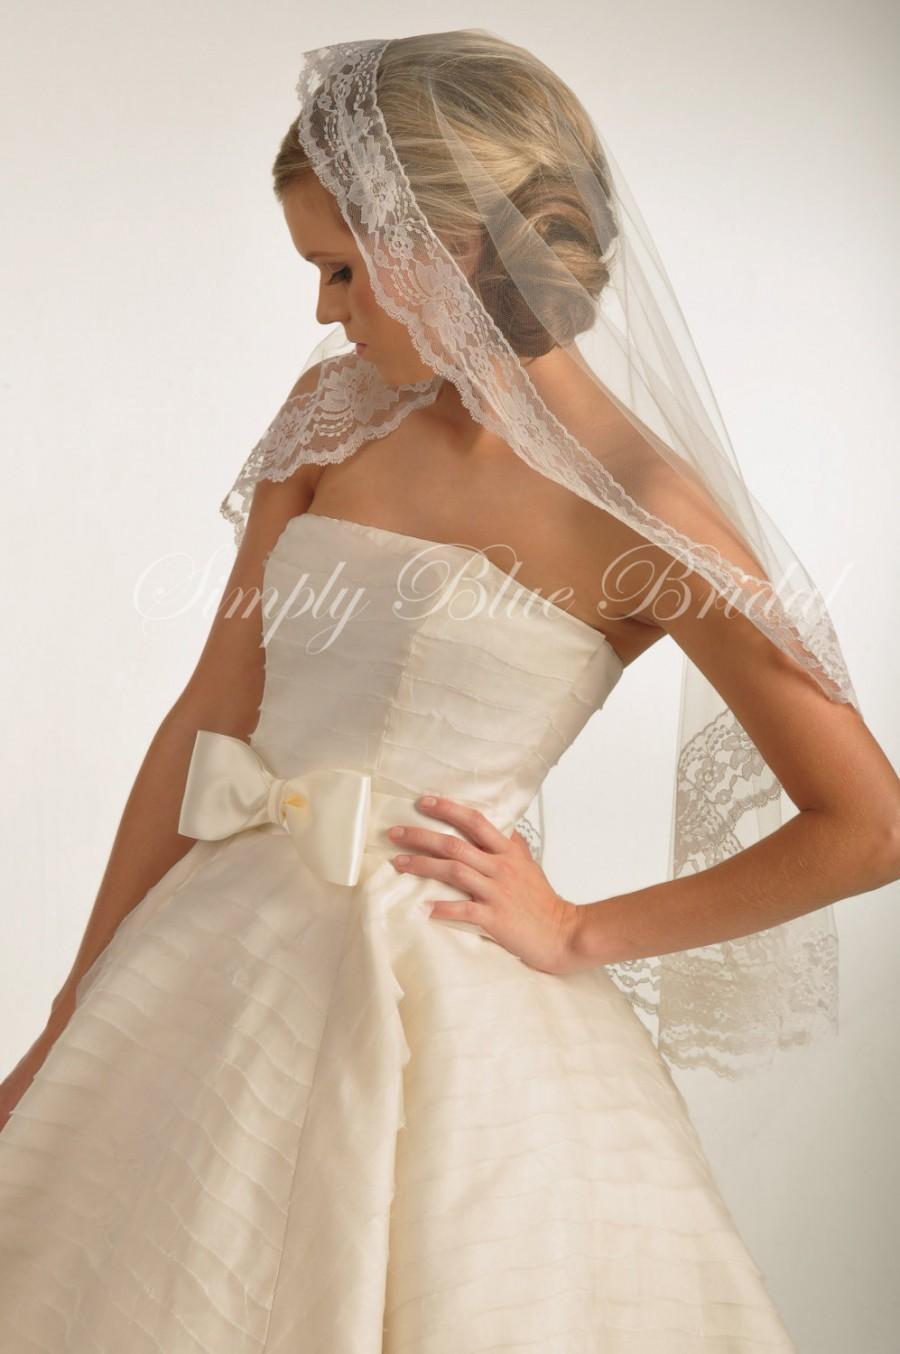 Hochzeit - IVORY Wedding Veil - Lace Mantilla Veil, Floral Lace Trim - Mantilla Wedding Veil Fingertip Length - READY to SHIP